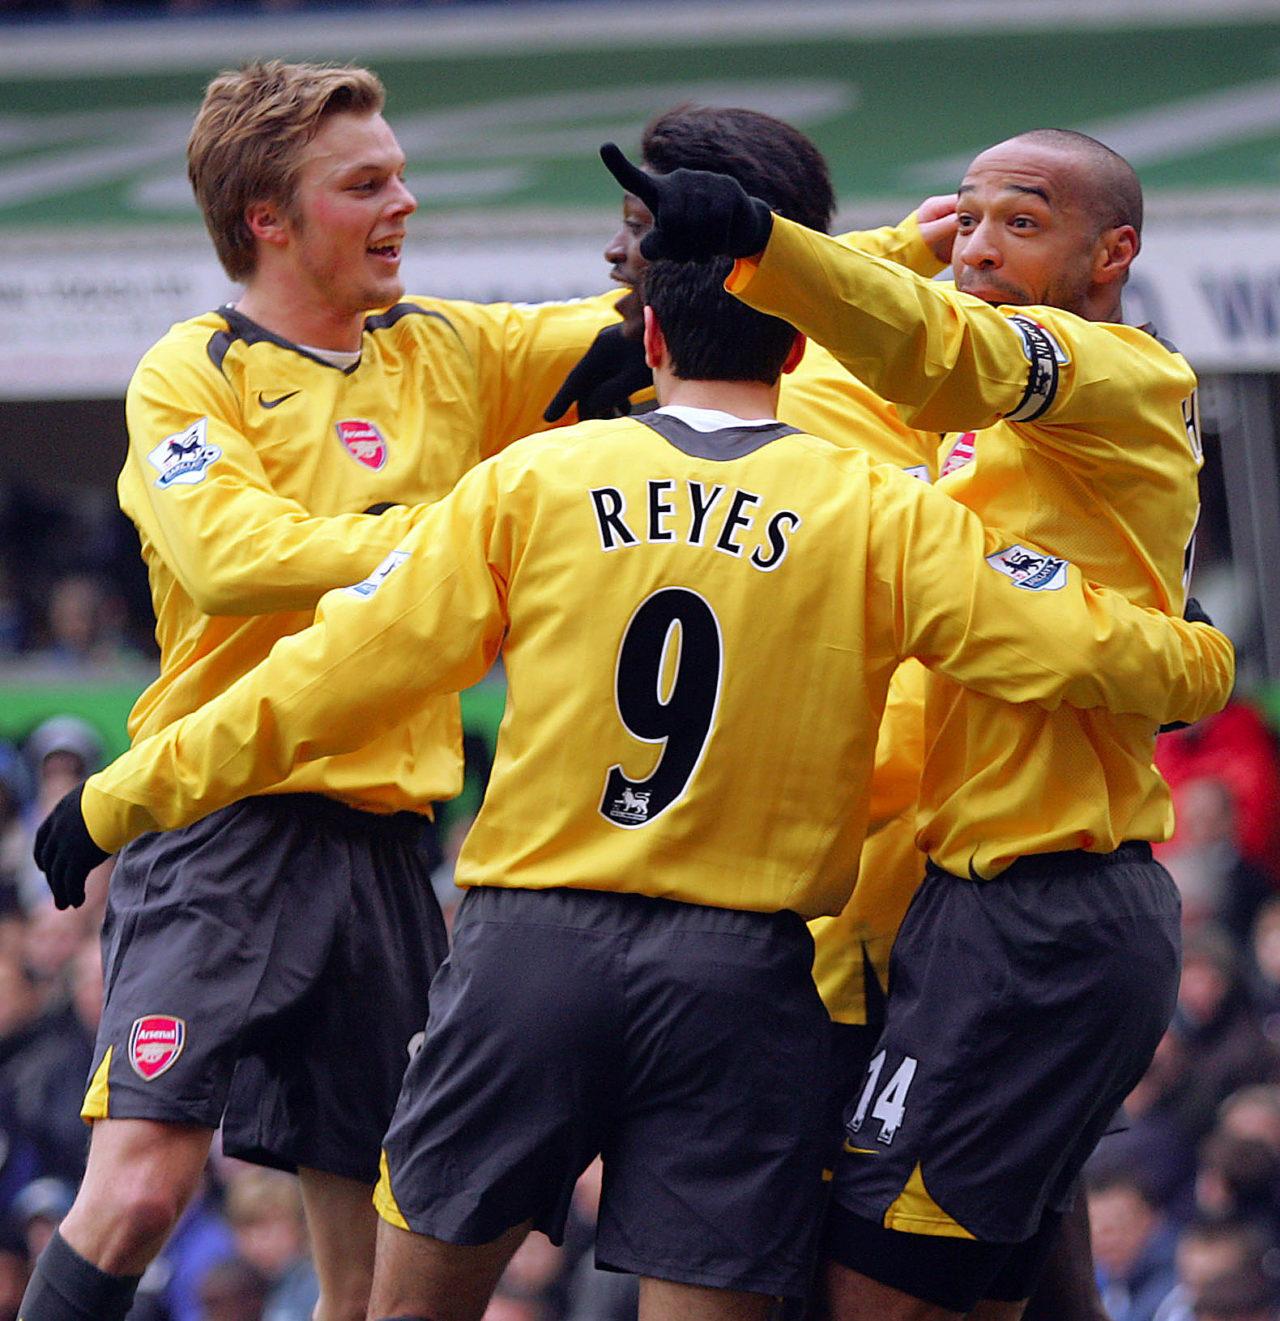 060204 Fotboll, Premier League (Engelsk Liga) Birmingham  v Arsenal: Sebastian Larsson, Jose Antonio Reyes, Emmanuel Adebayor och Thierry Henry, Arsenal (Jubel) © BildbyrŒn - Cop 7